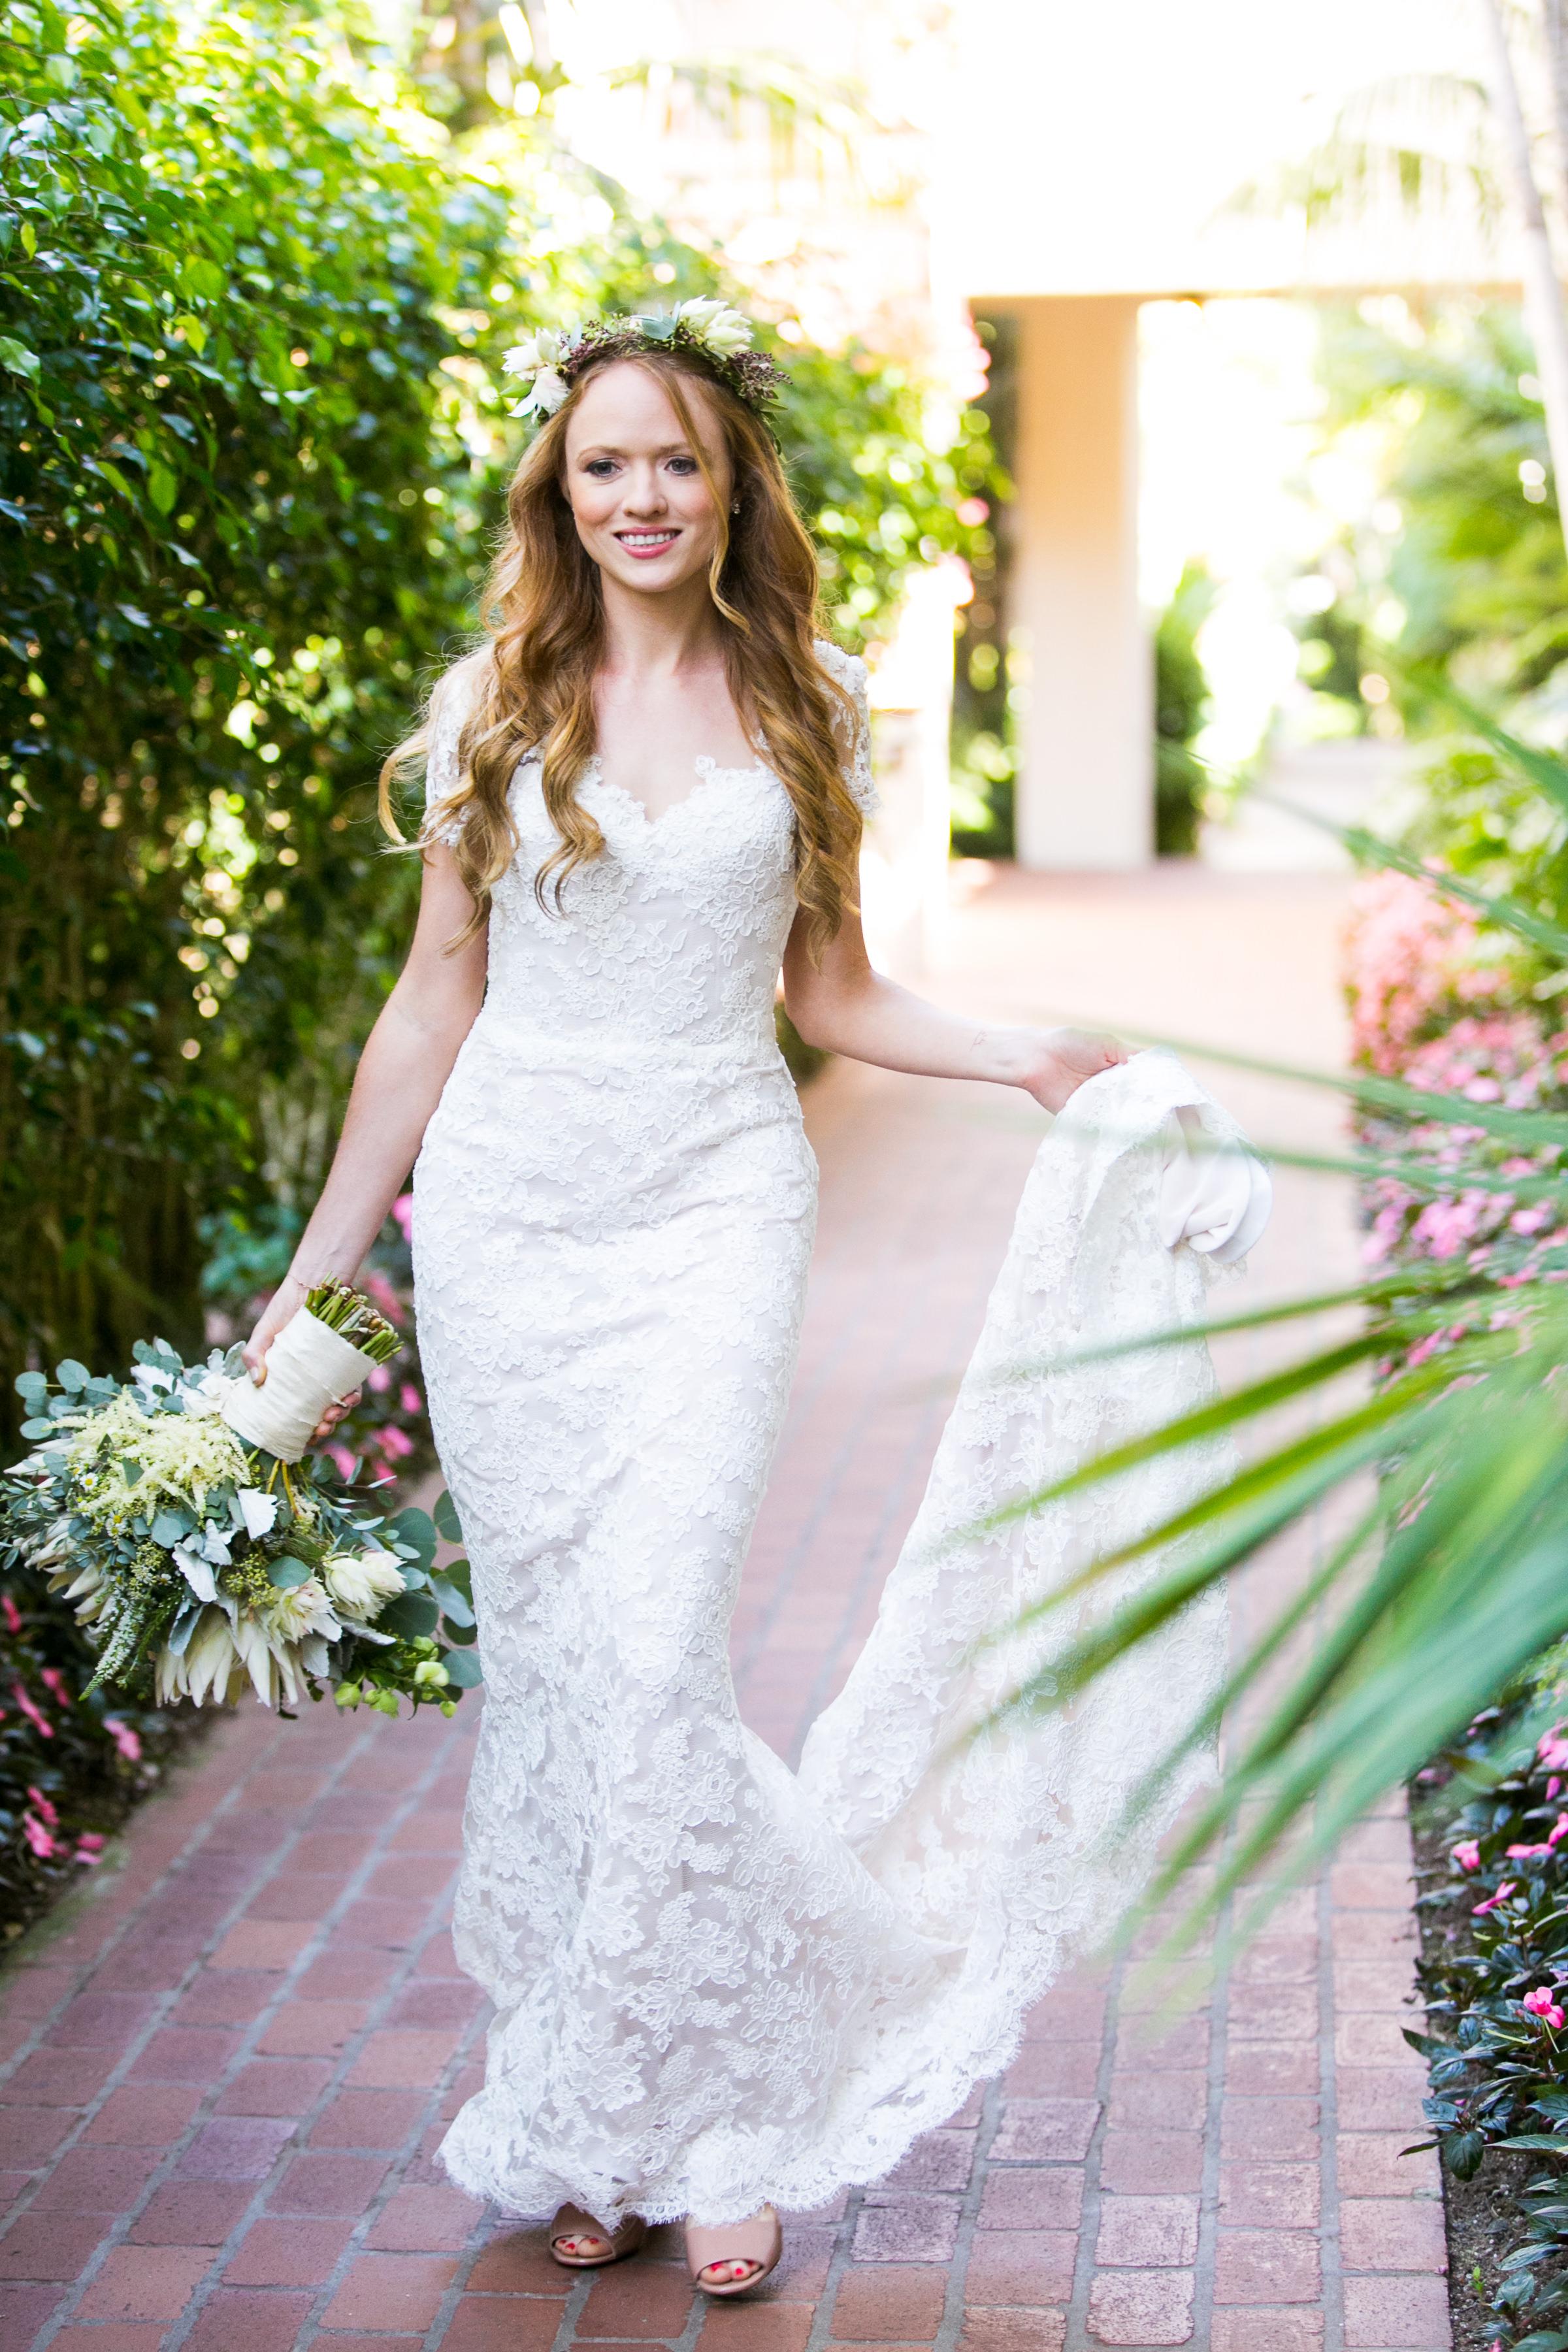 www.santabarbarawedding.com   Four Seasons Santa Barbara   Levine Fox Events   Callaway Gable Photo   Bride